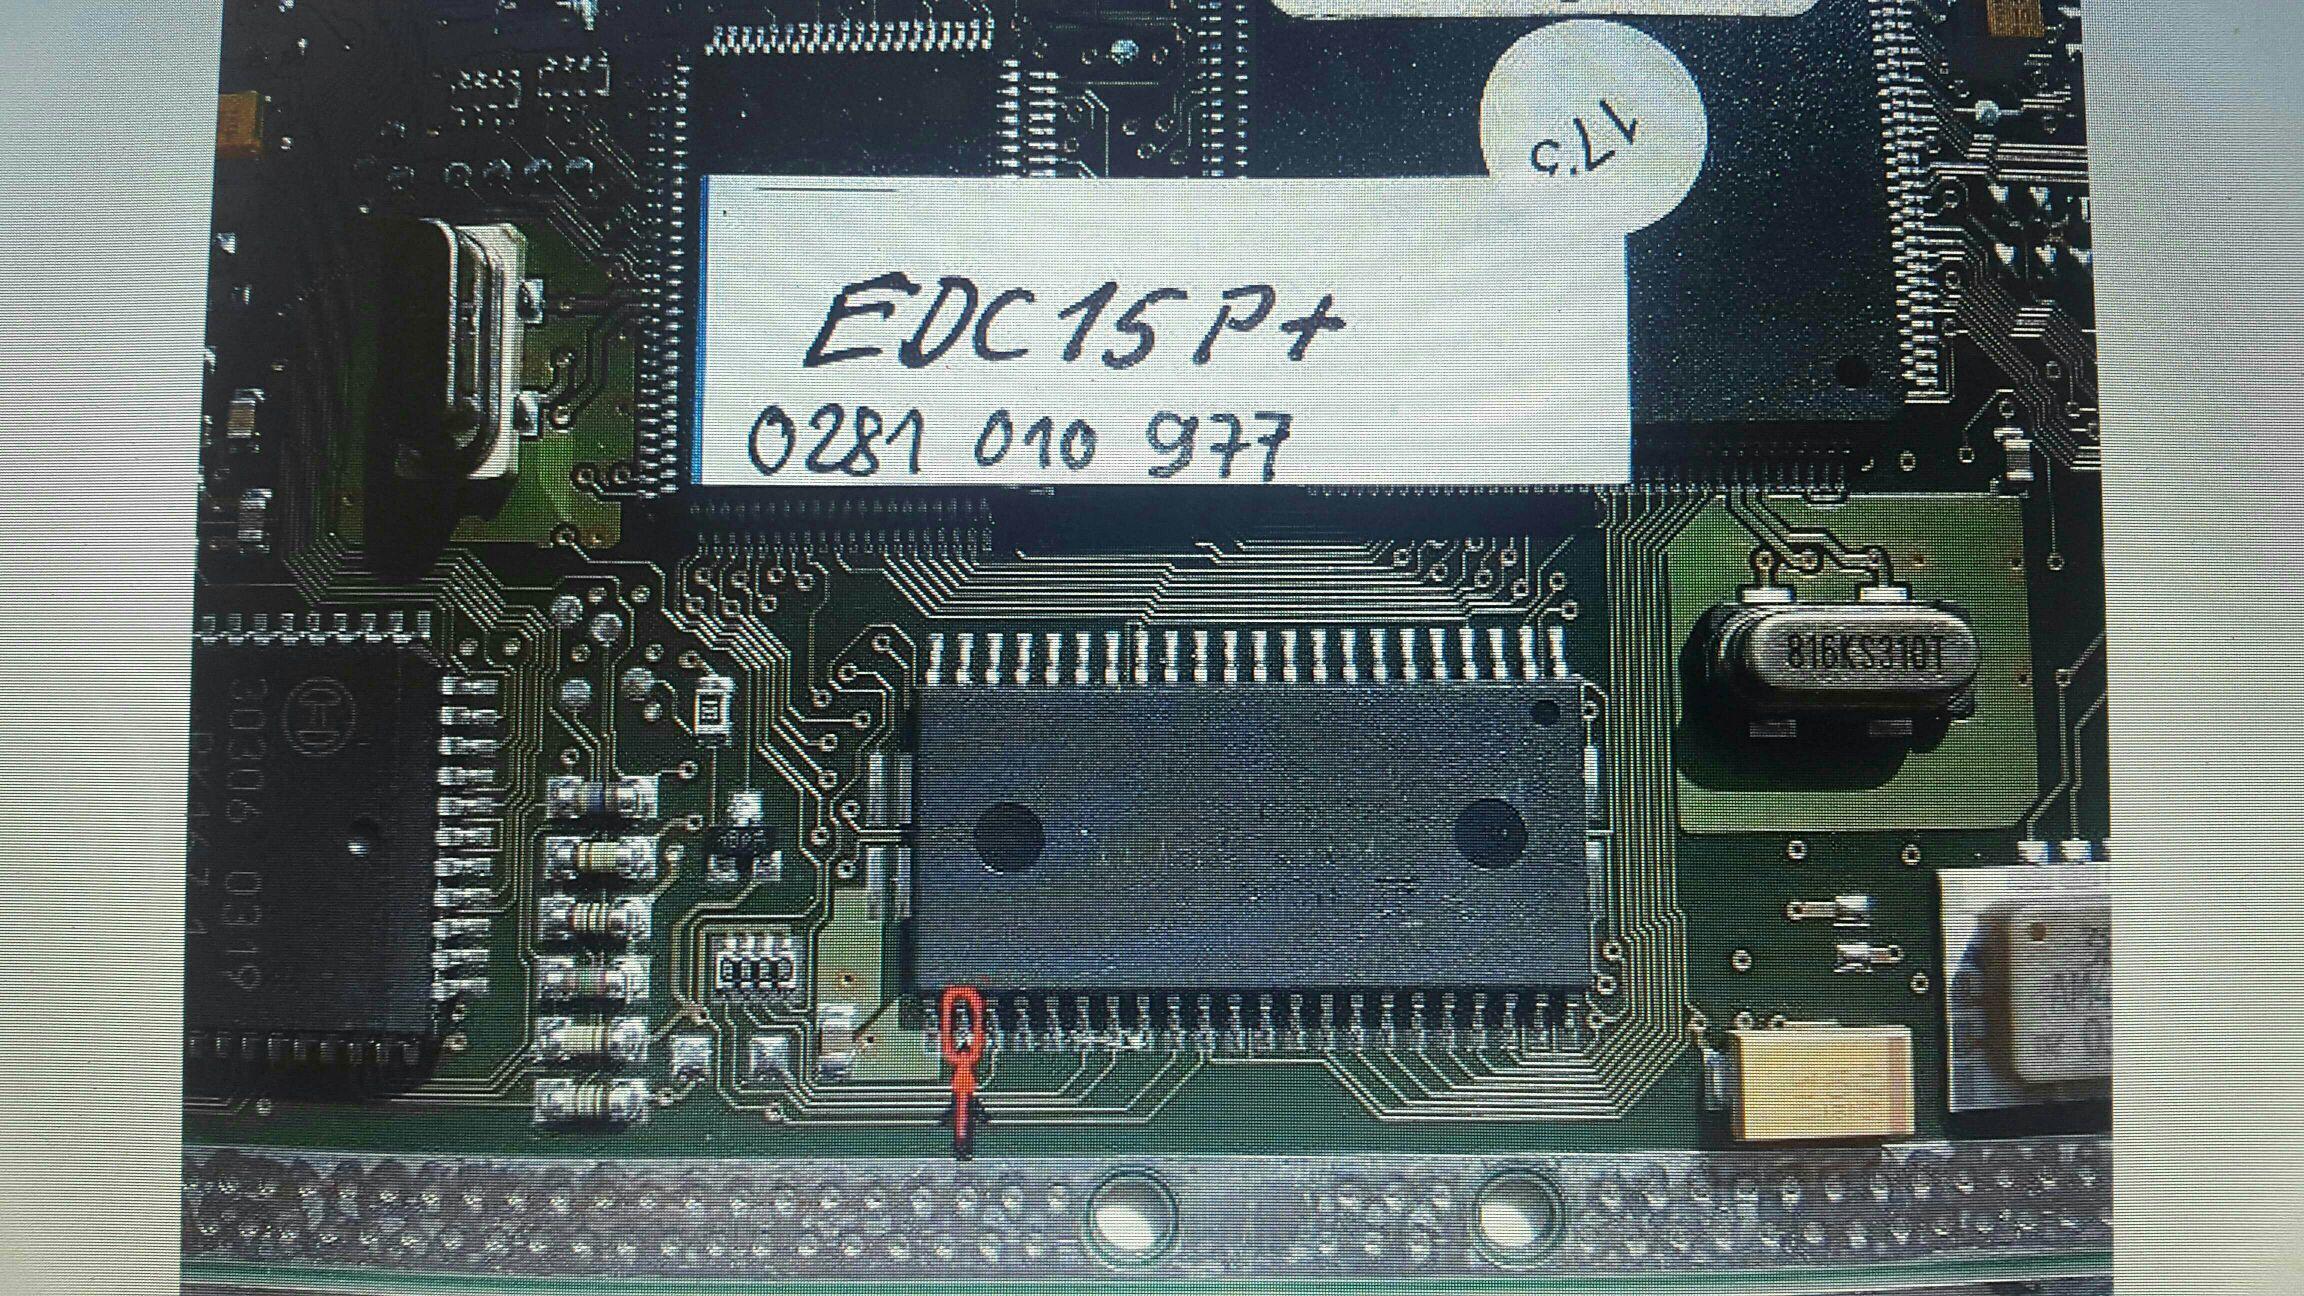 EDC15p+ VW Passat pinout problem